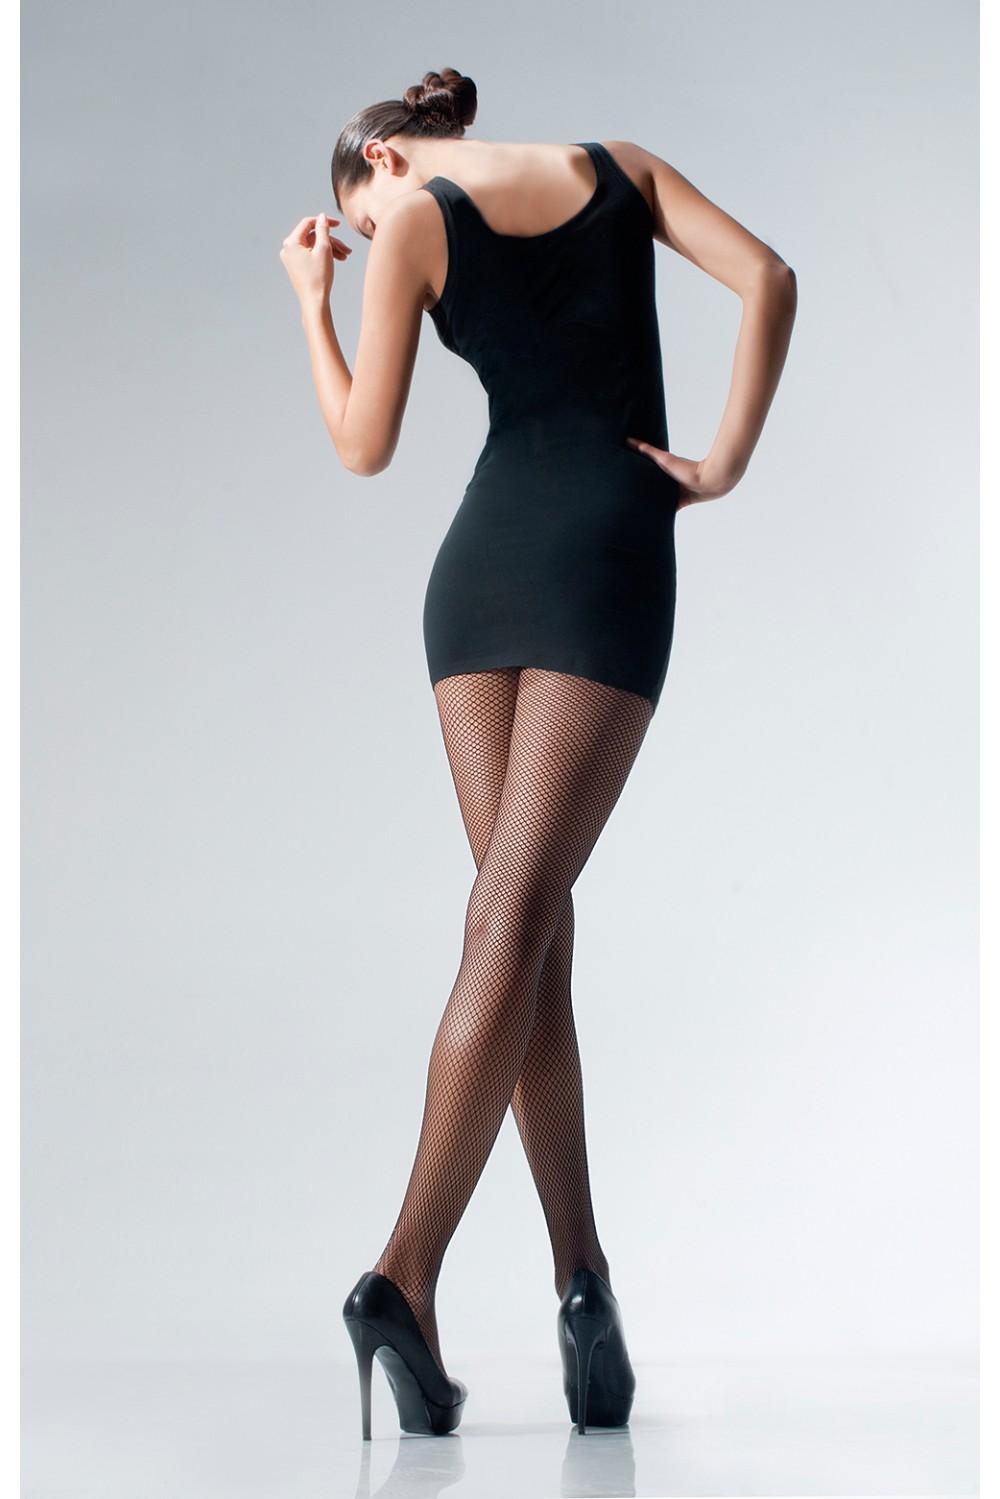 a5f20aa962427 Cecilia de Rafael - Comfortable seamless fishnet tights Rettem ✅